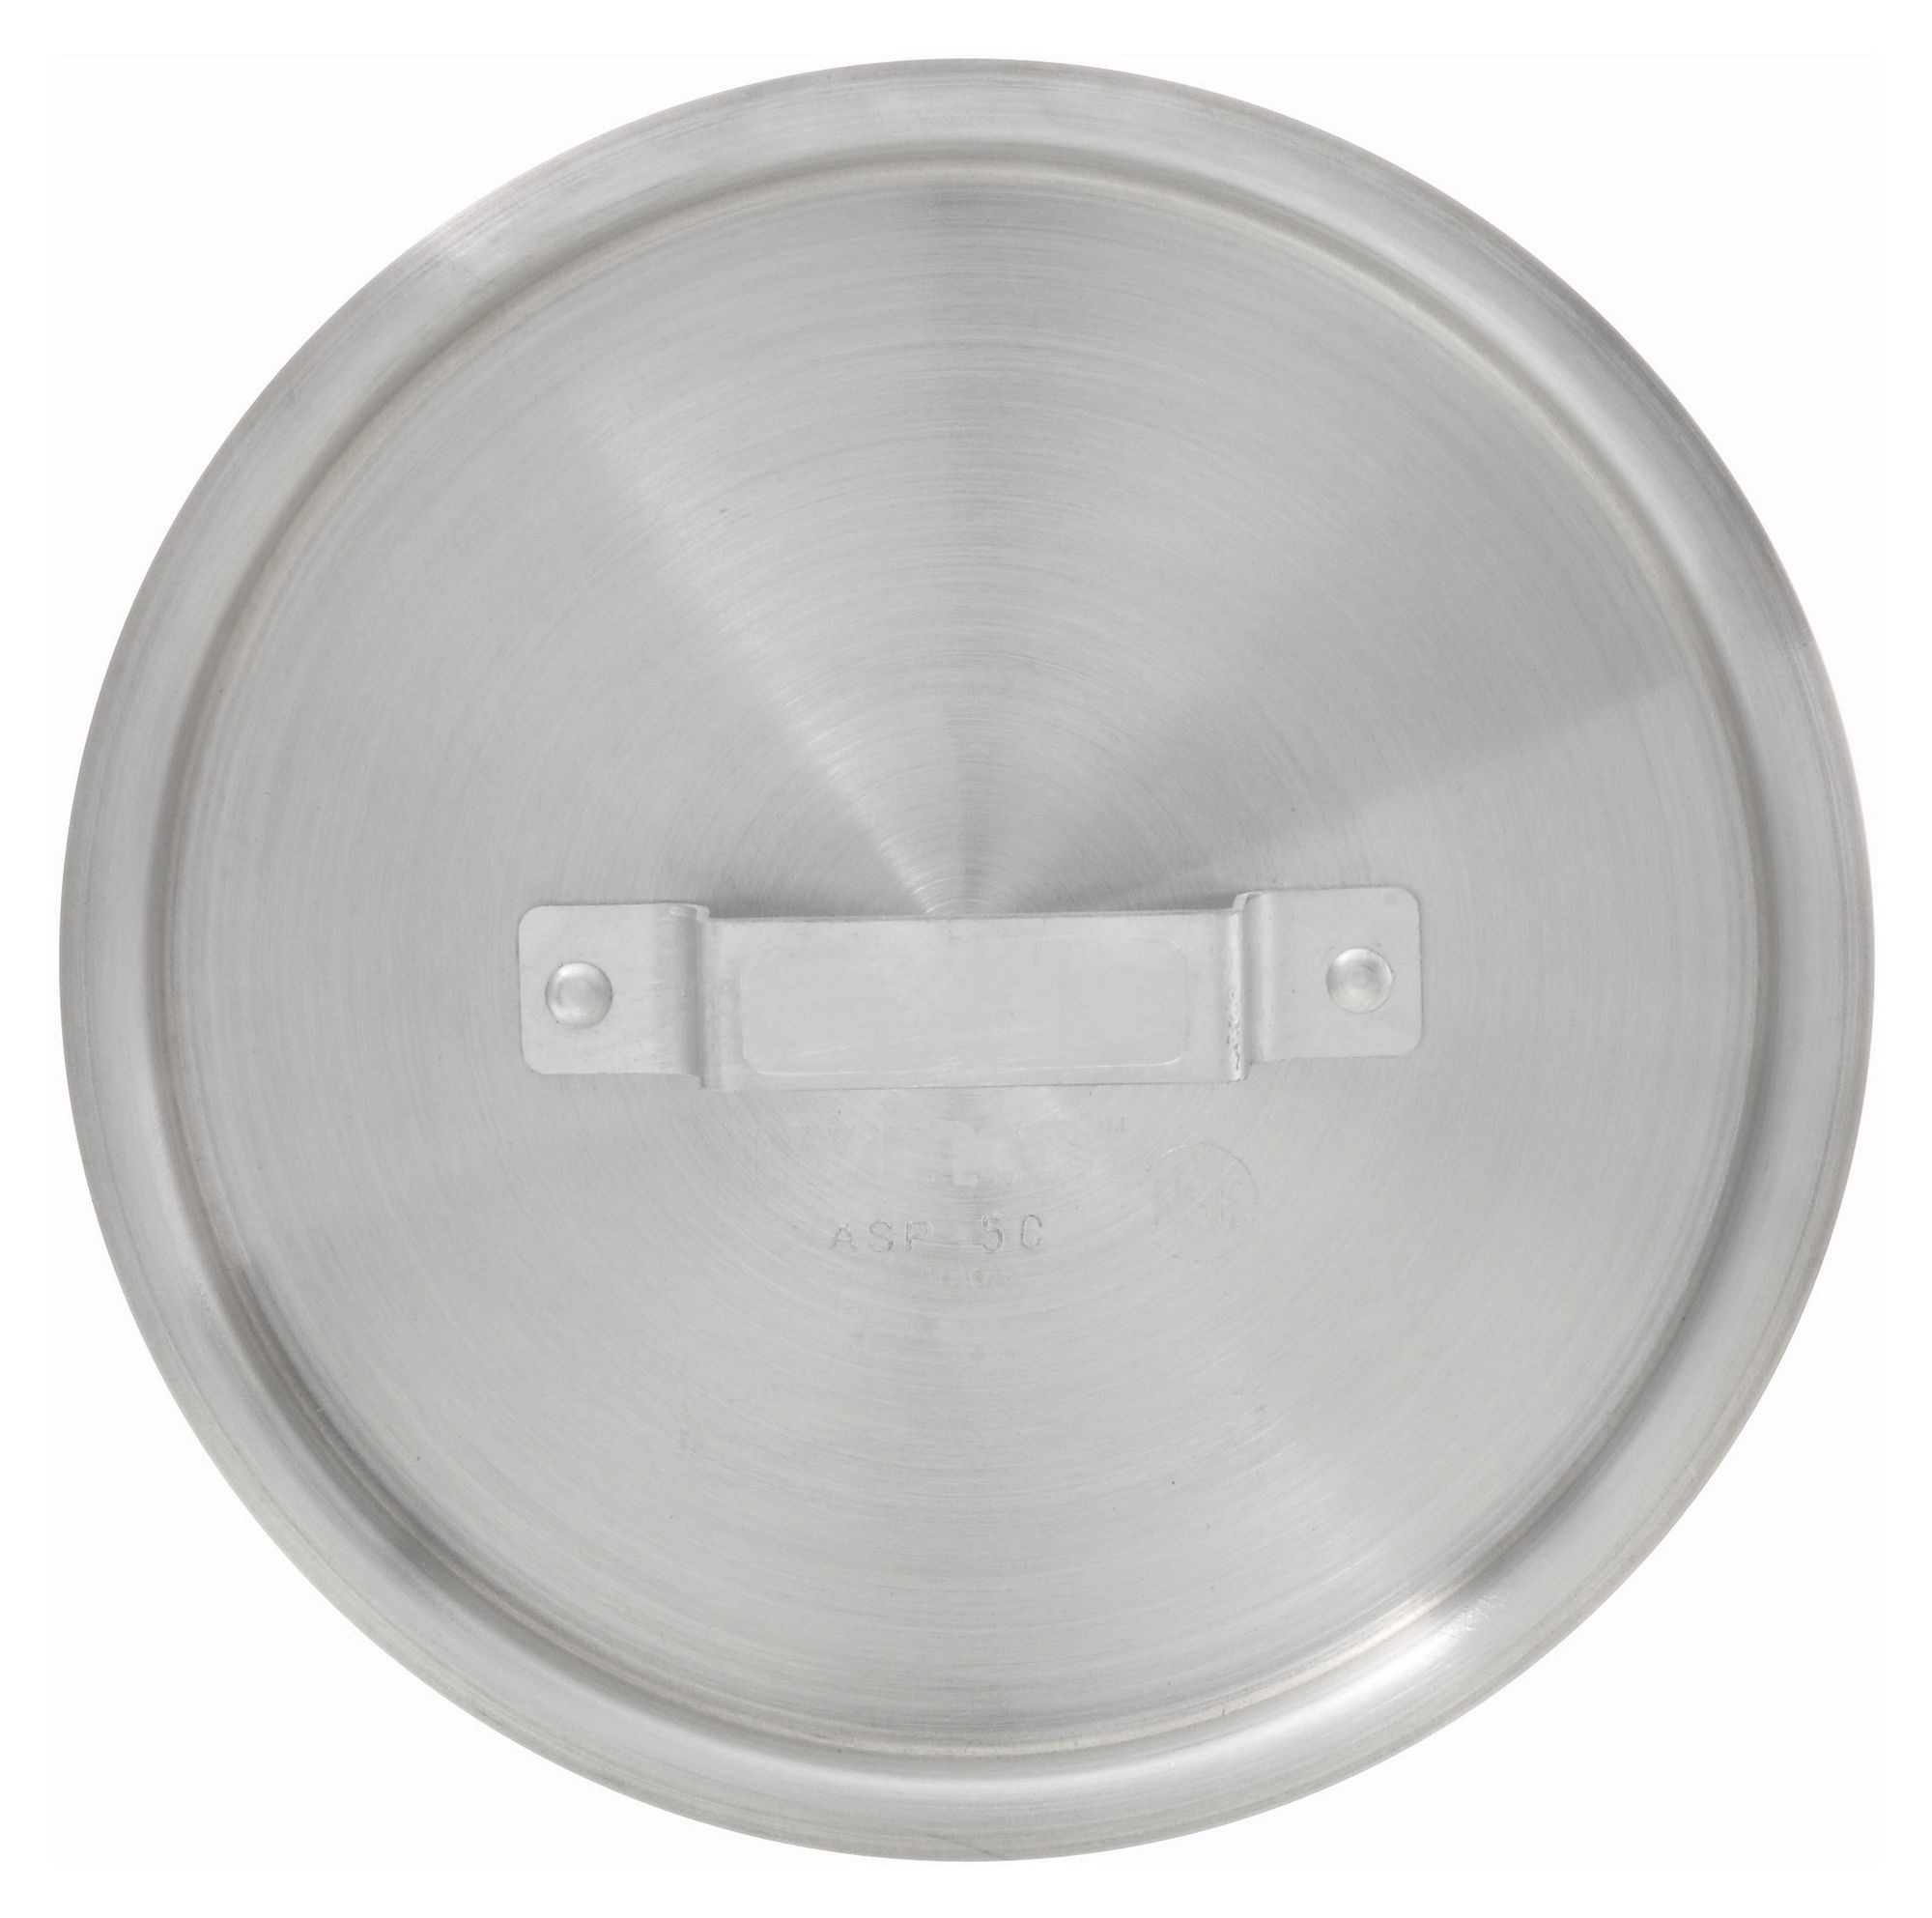 Winco ASP-1C Aluminum Lid for 1 Qt. Sauce Pan (ASP-1)